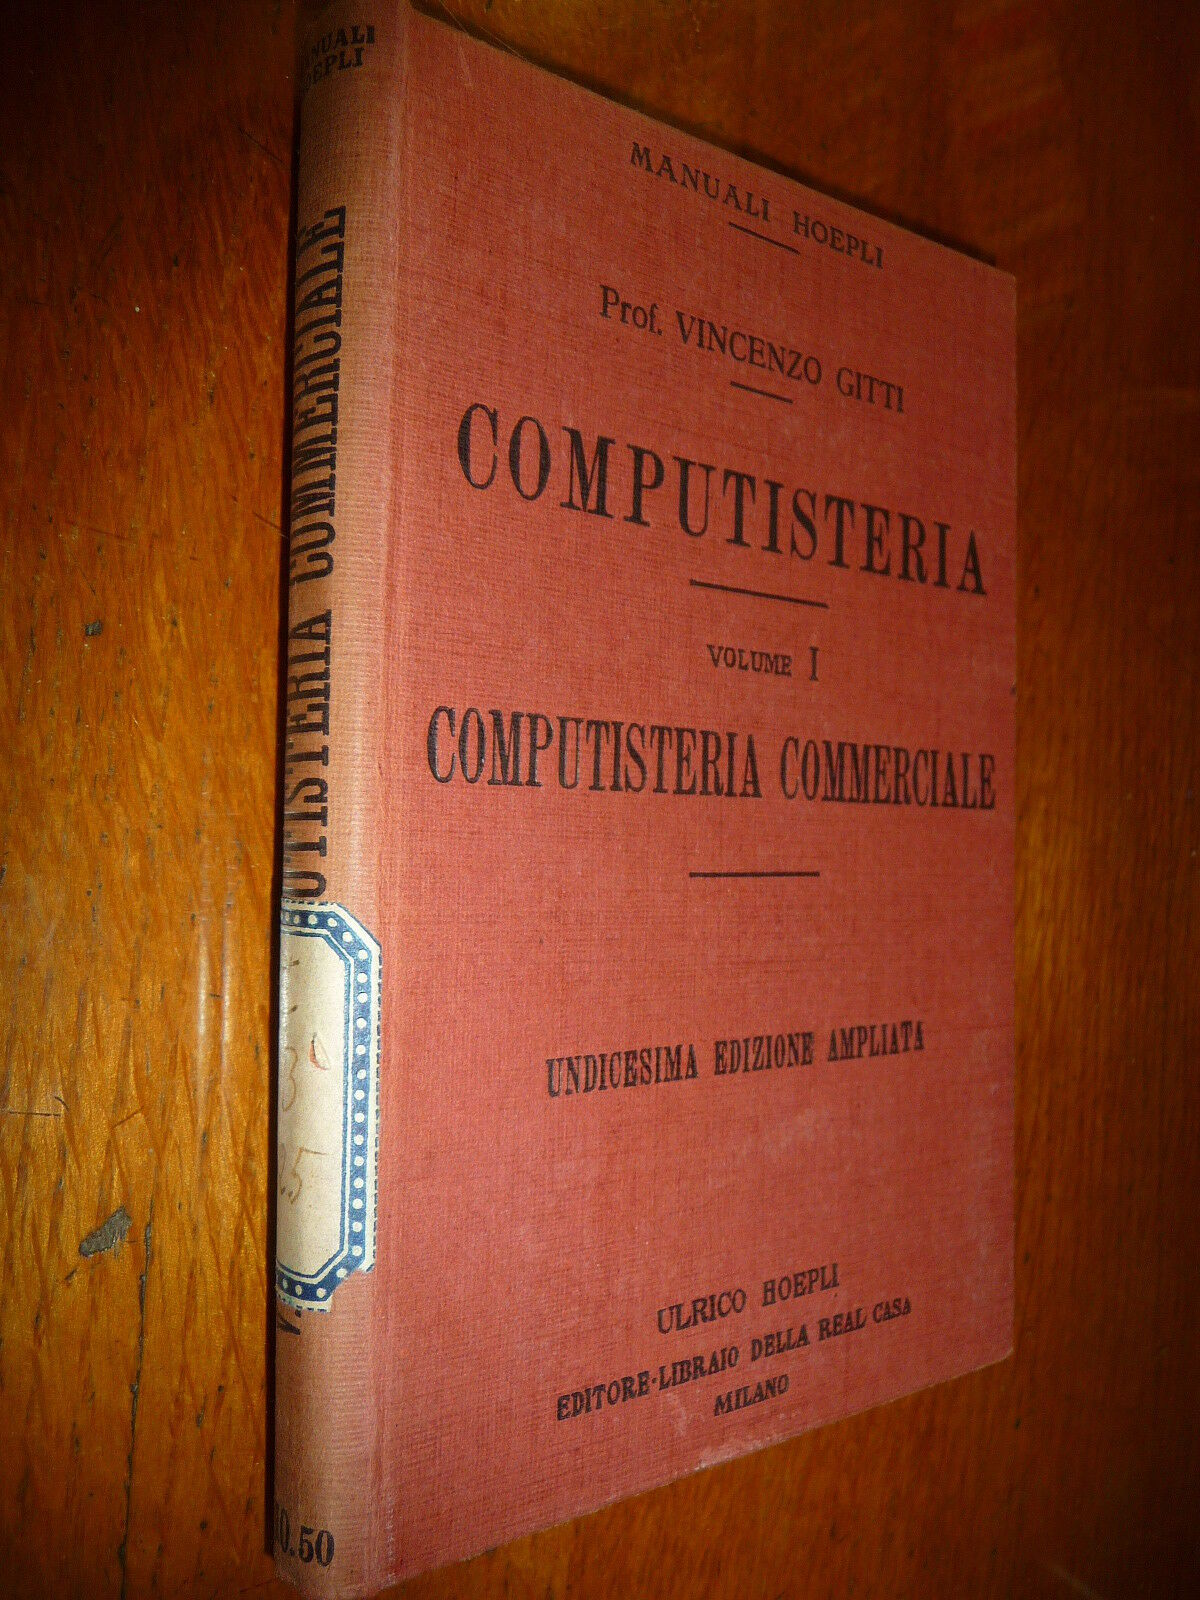 COMPUTISTERIA COMPUTISTERIA COMMERCIALE PROF. VINCENZO GITTI Vol I HOEPLI 1930